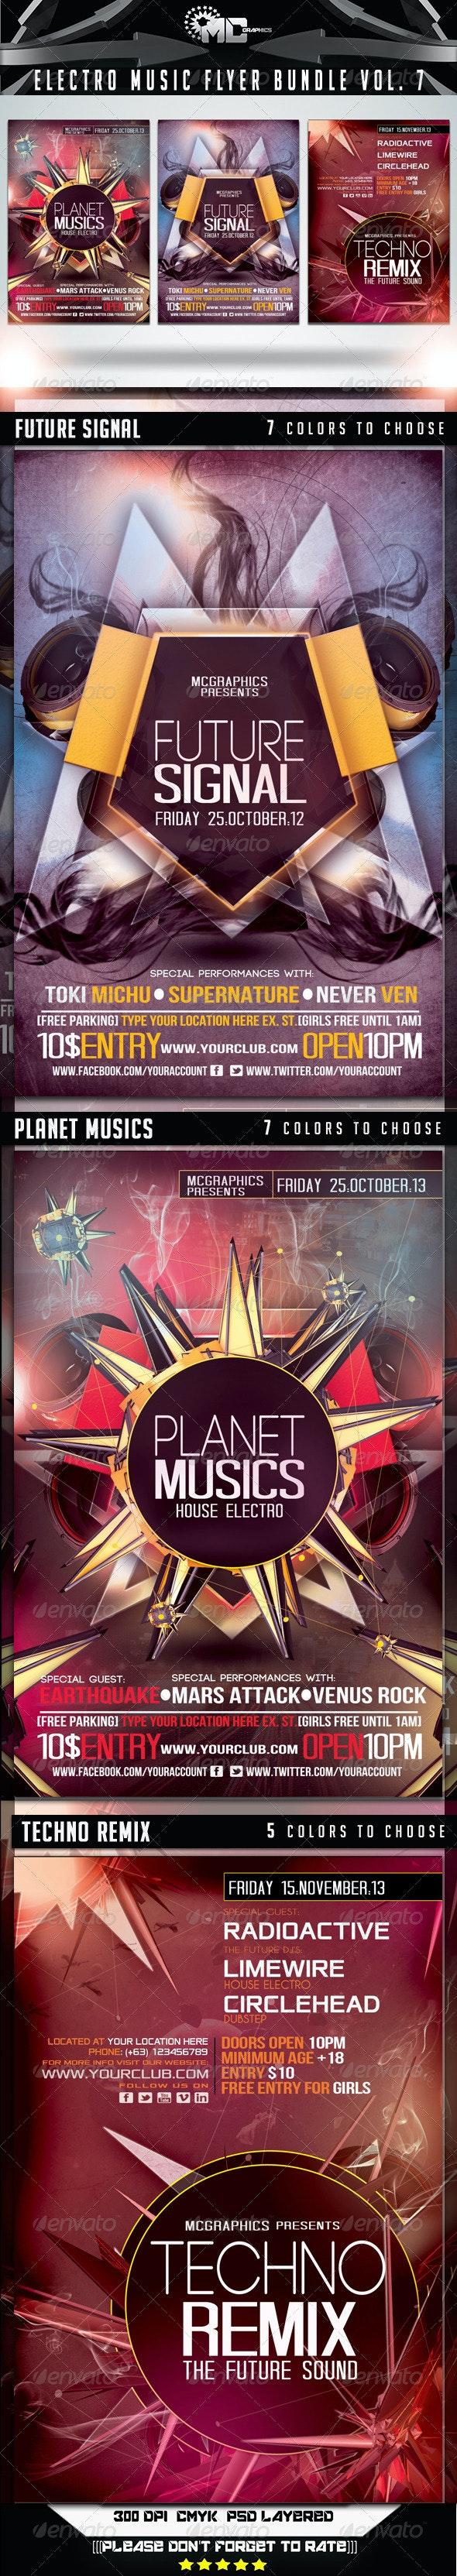 Electro Music Flyer Bundle Vol. 7 - Flyers Print Templates